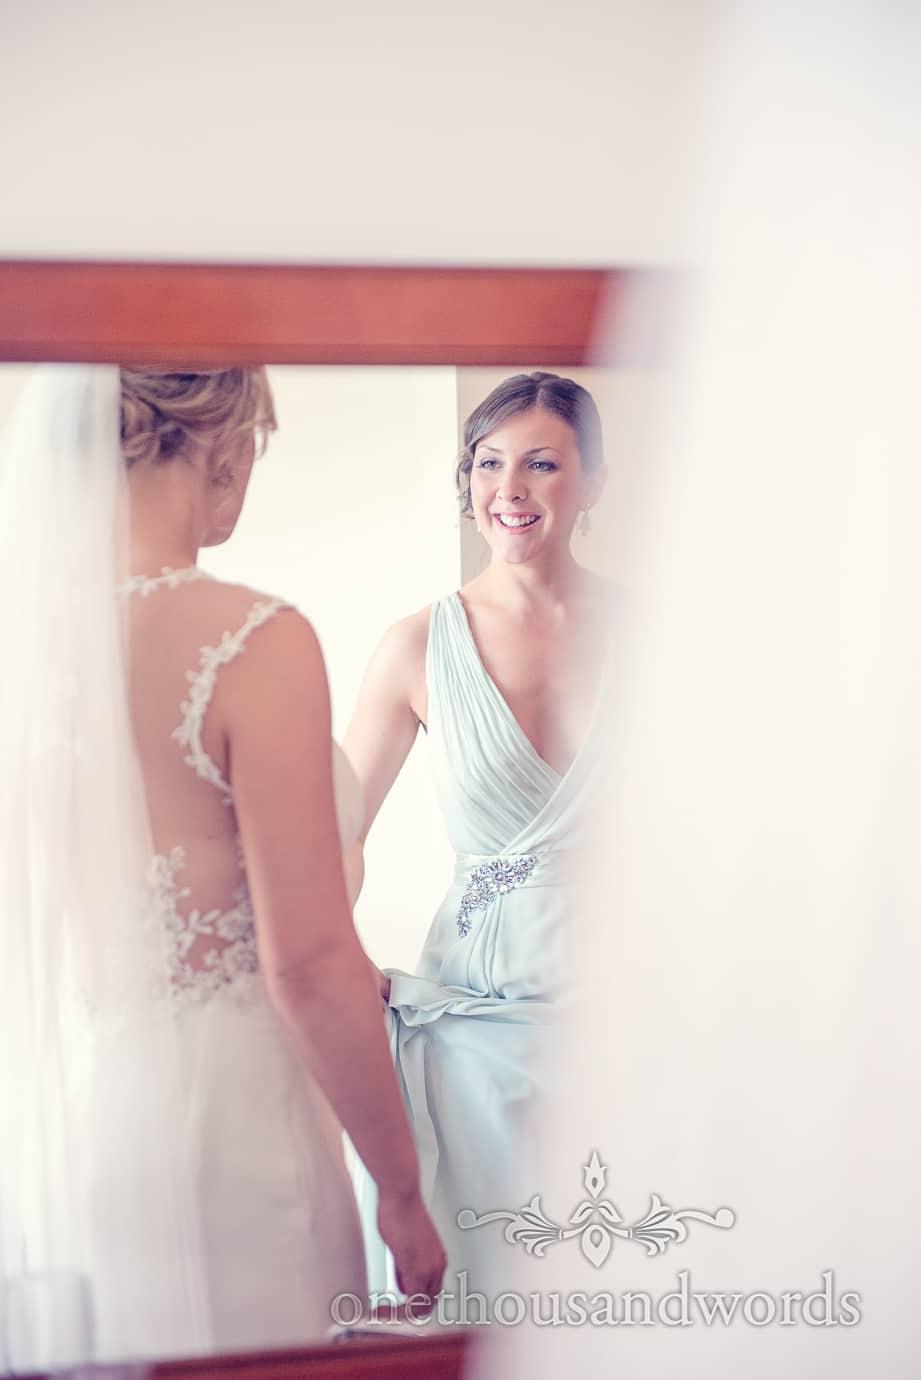 Bride and bridesmaid in mirror from Italian Villa Wedding Photographs